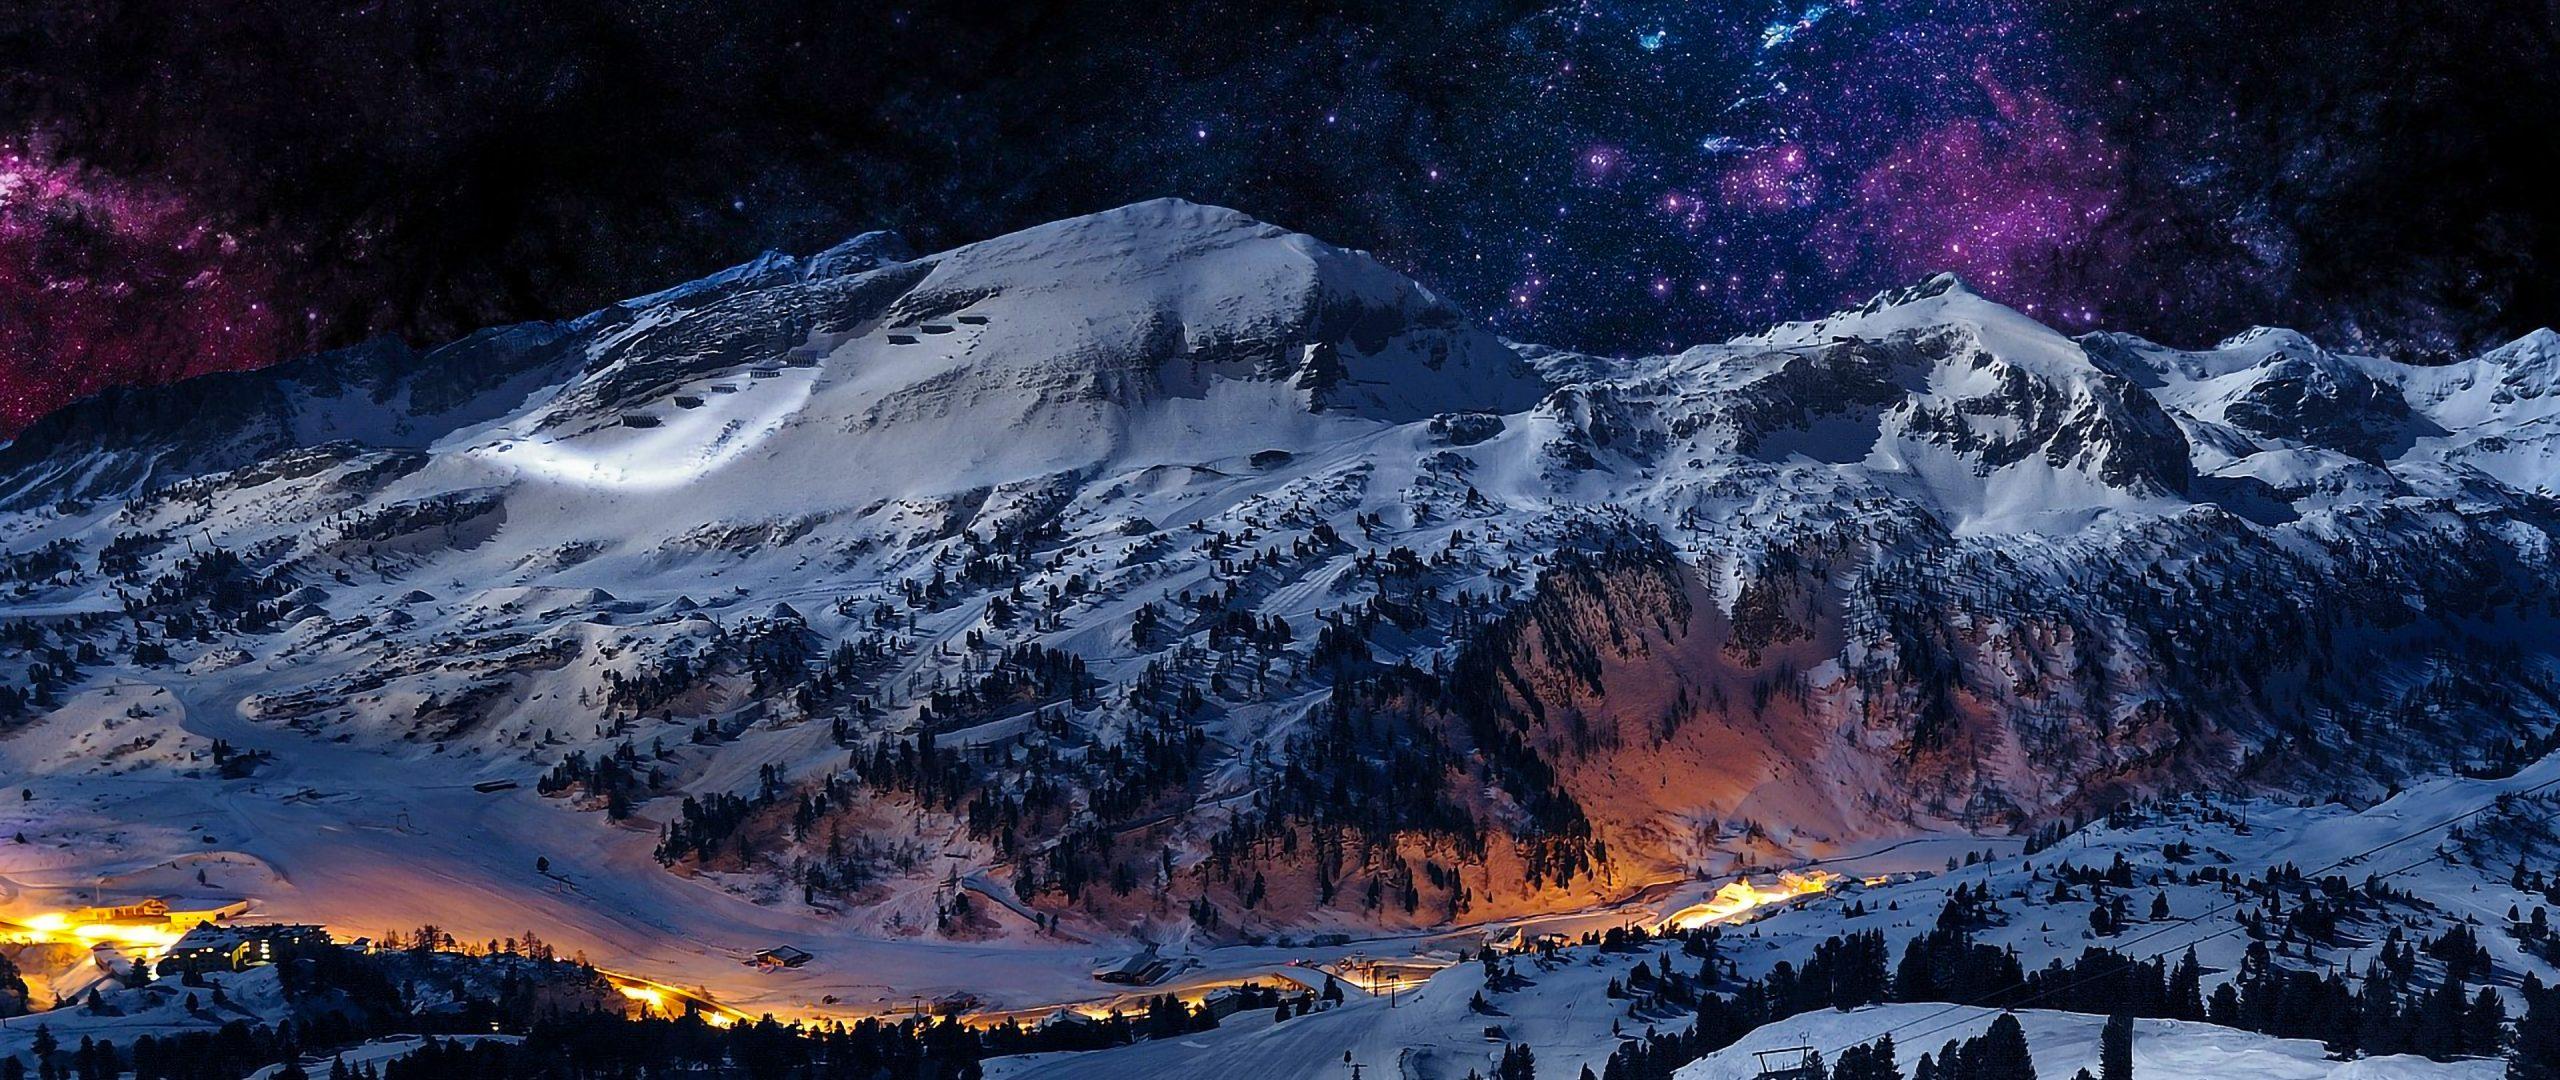 Mountain Night Sky Snow Blue Stars Nature 4k Wallpaper Best Wallpapers